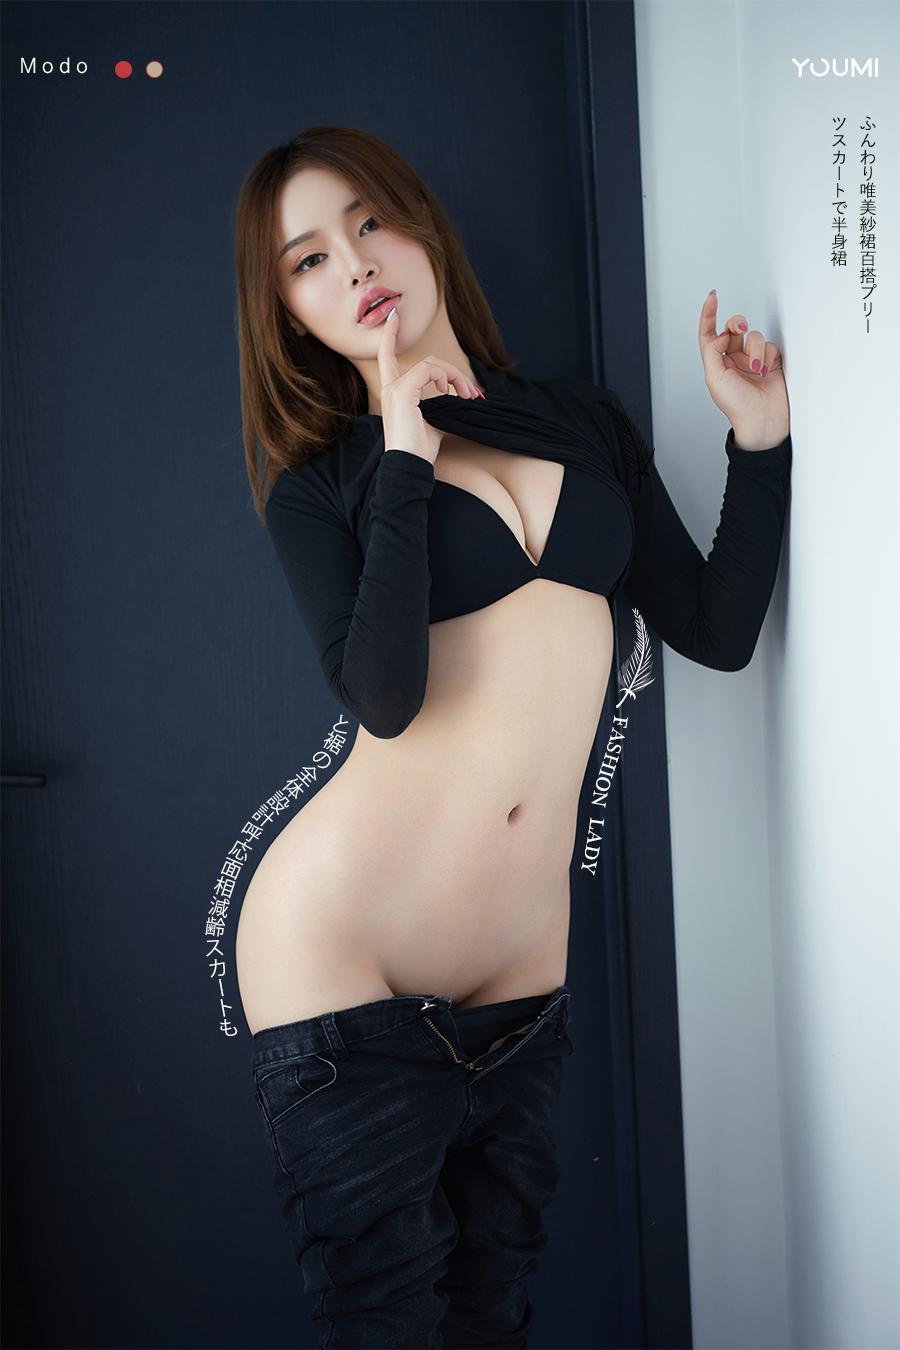 [YouMi尤蜜]2019.12.20 黑色丽娘 陈宇曦[/20MB]